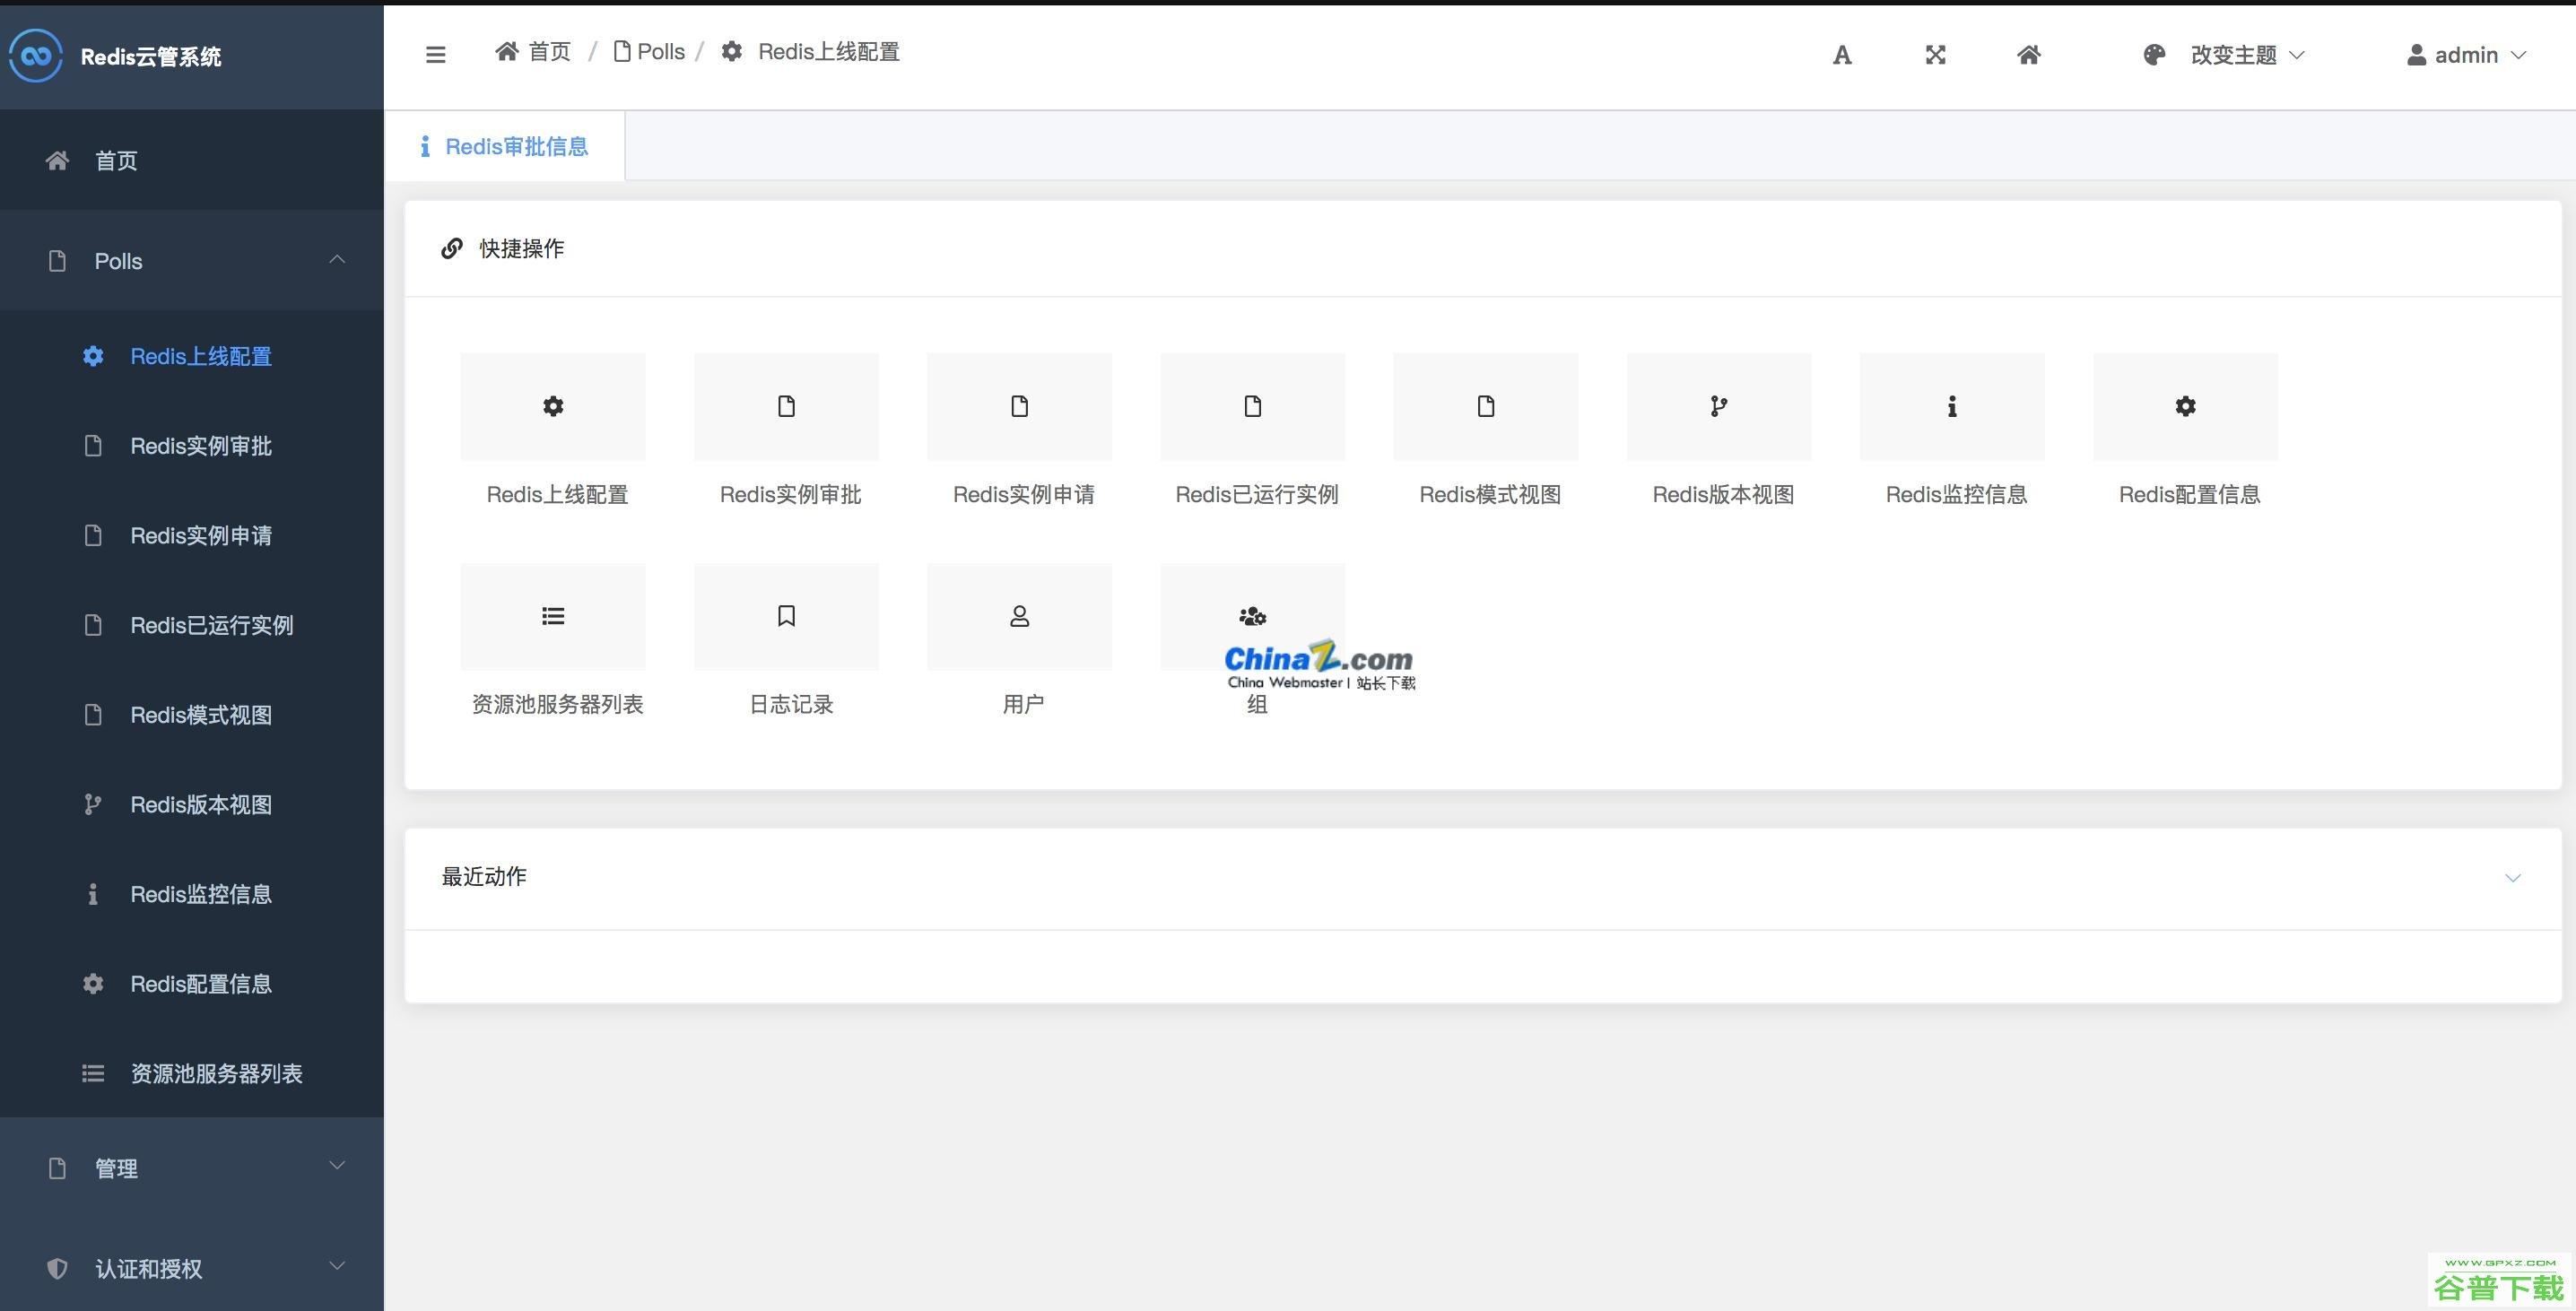 Redis管理平台Repoll源代码免费下载